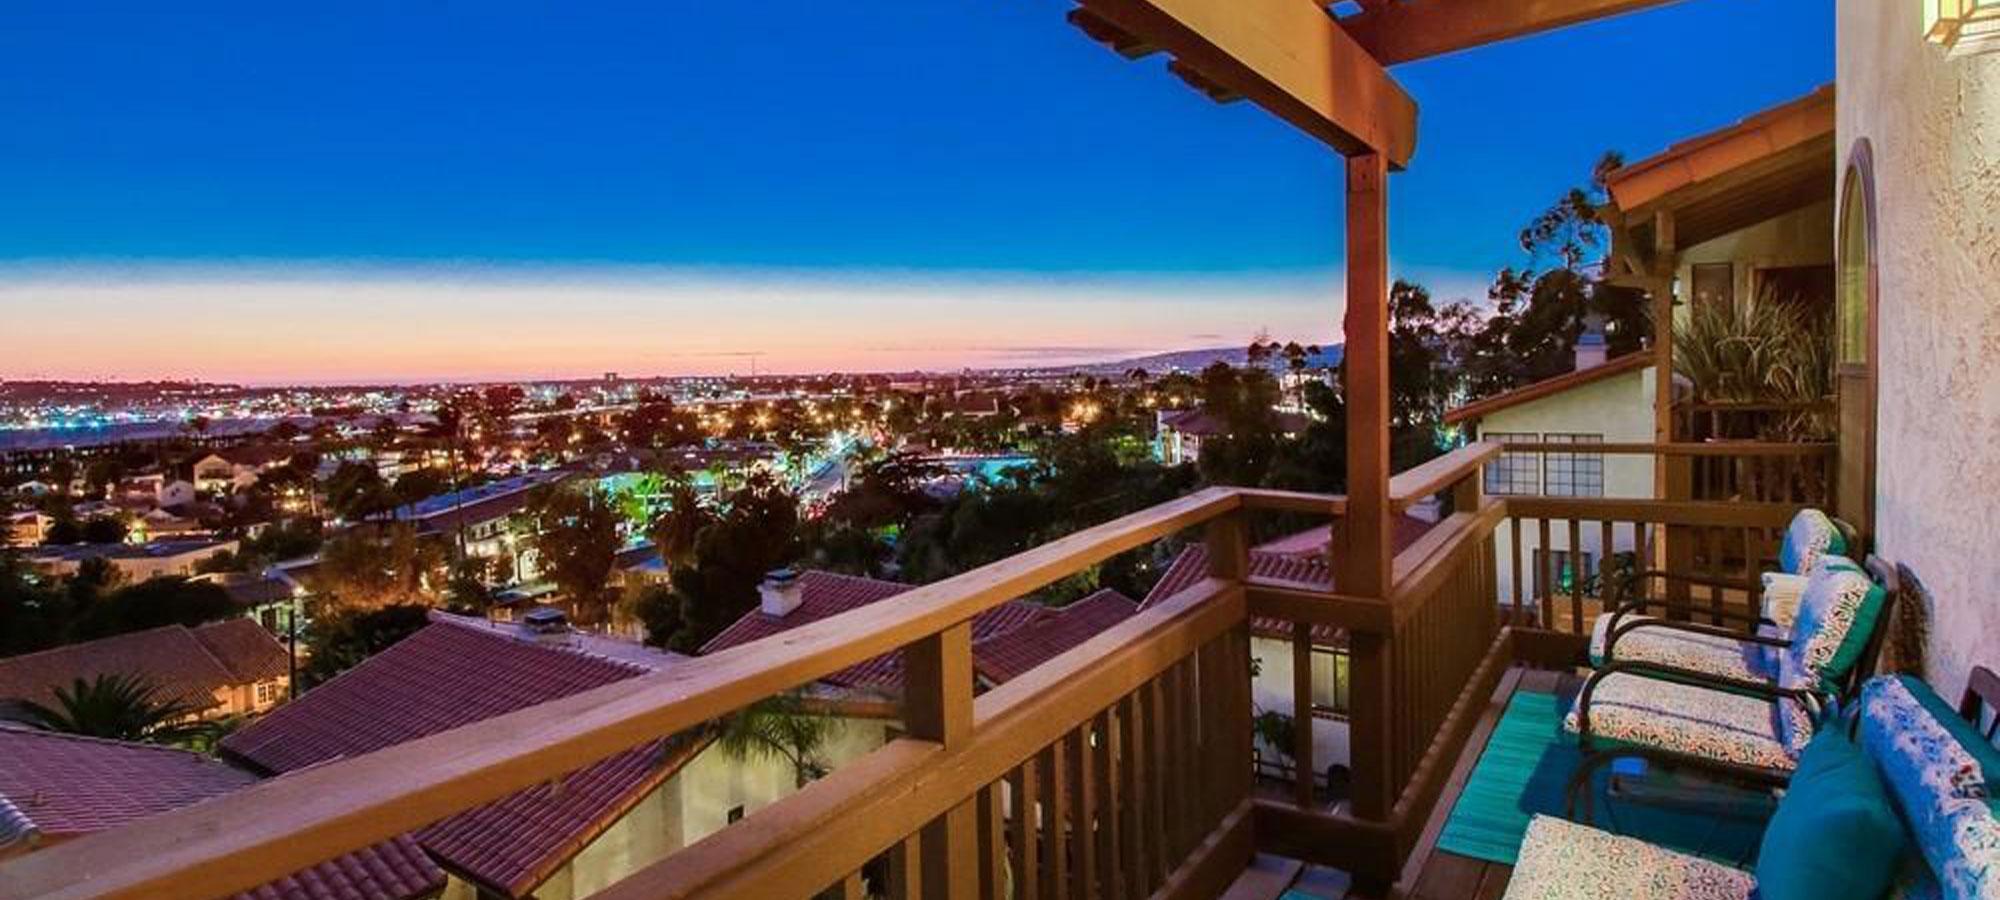 4006 Ampudia St San Diego, CA 92110